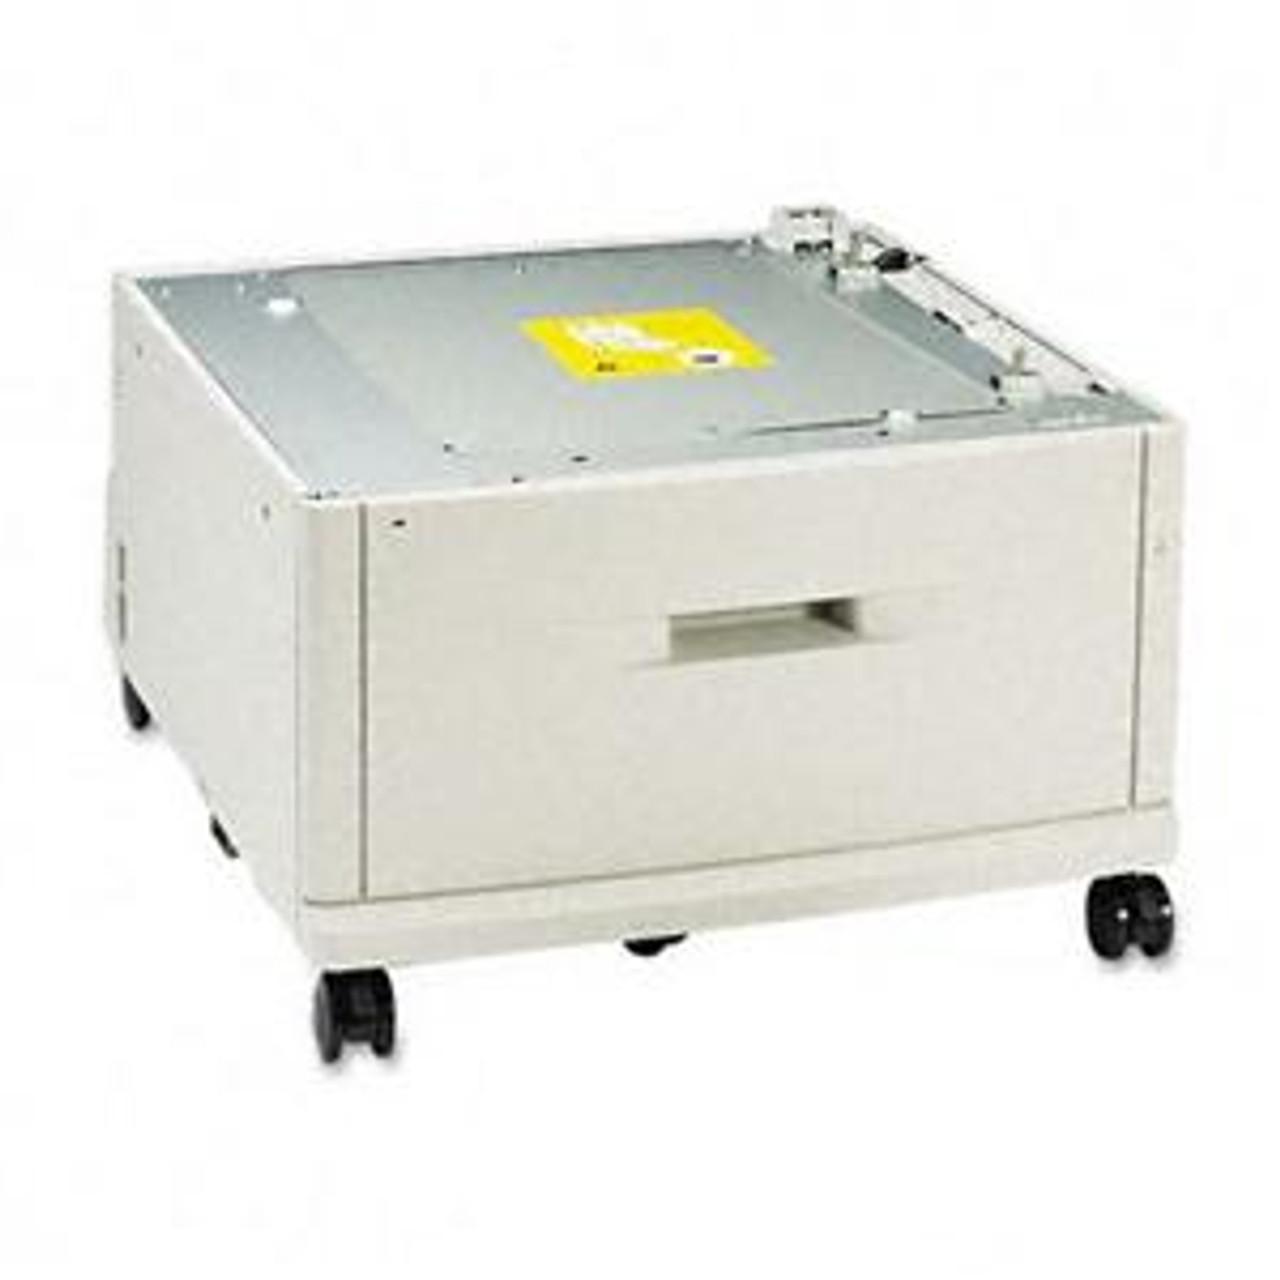 2000 Sheet Optional Feeder HP LaserJet 9000 9040 9050